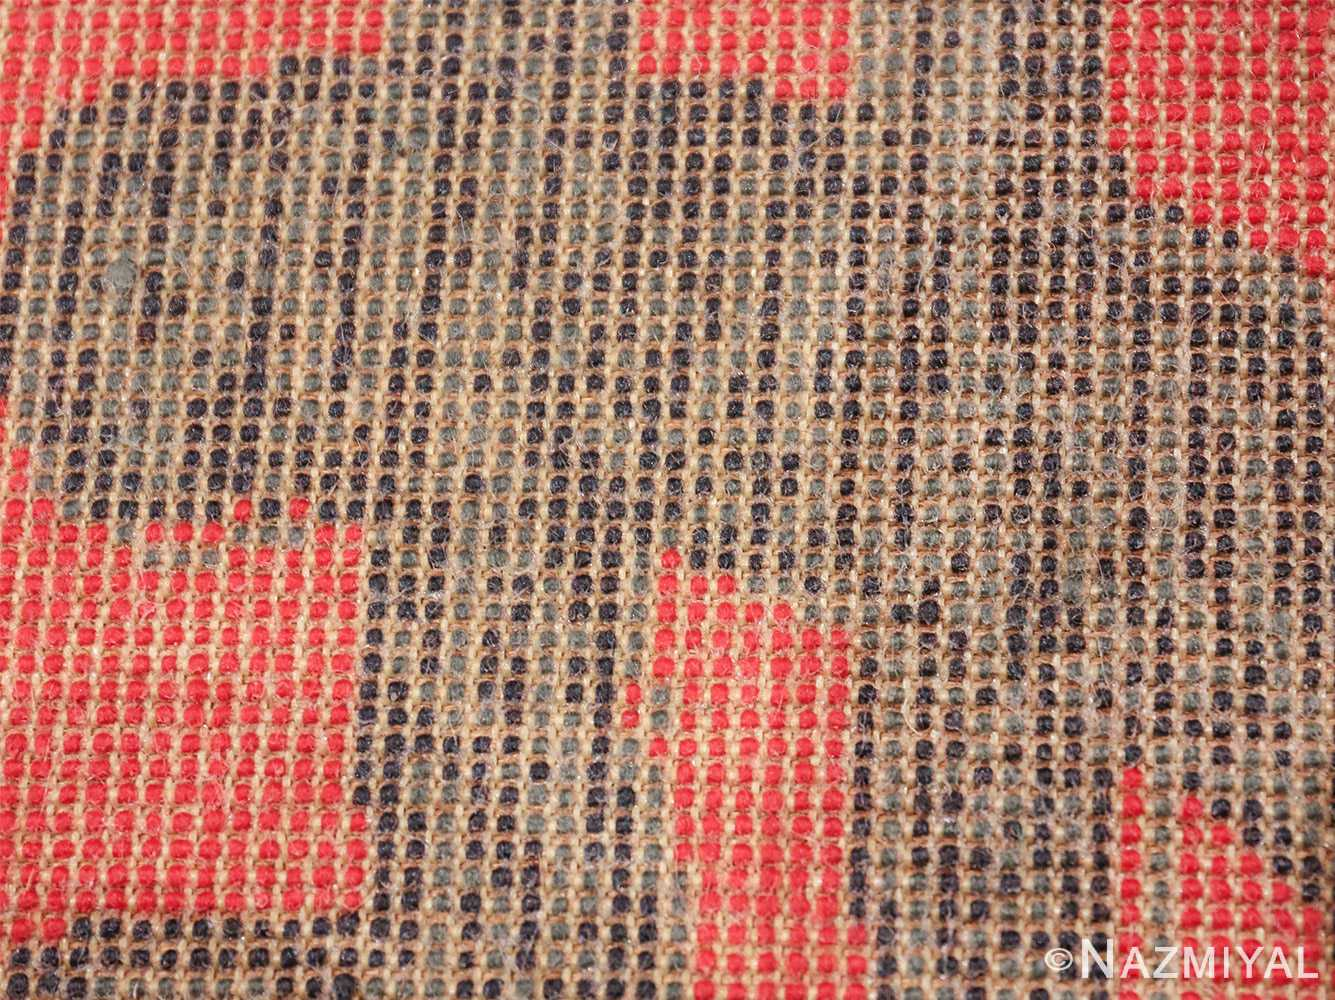 vintage scandinavian andy warhol dollar sign art rug 49671 knots Nazmiyal